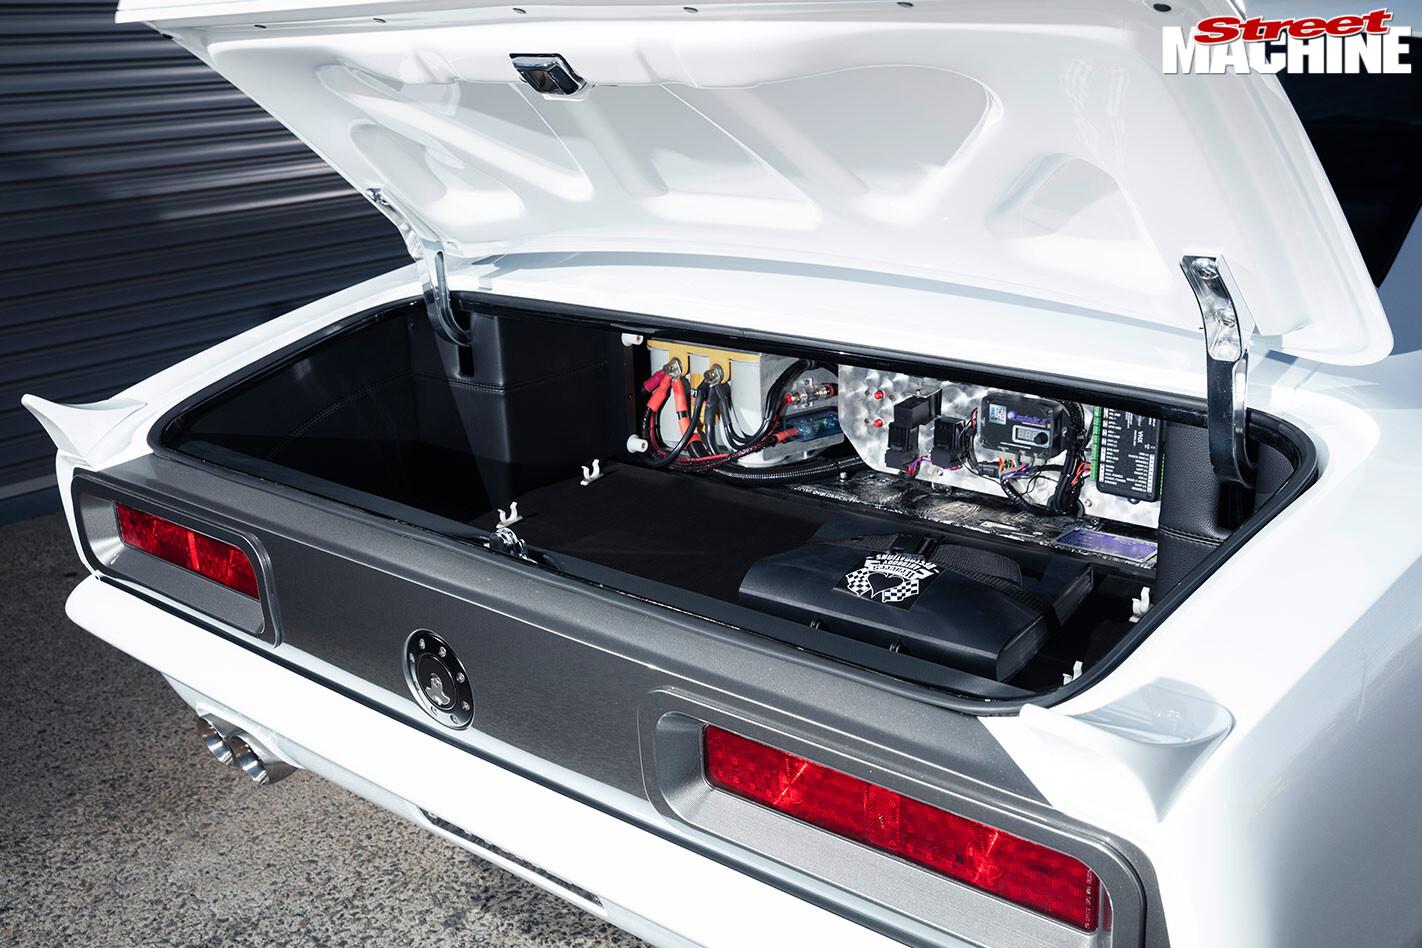 Chev Camaro boot